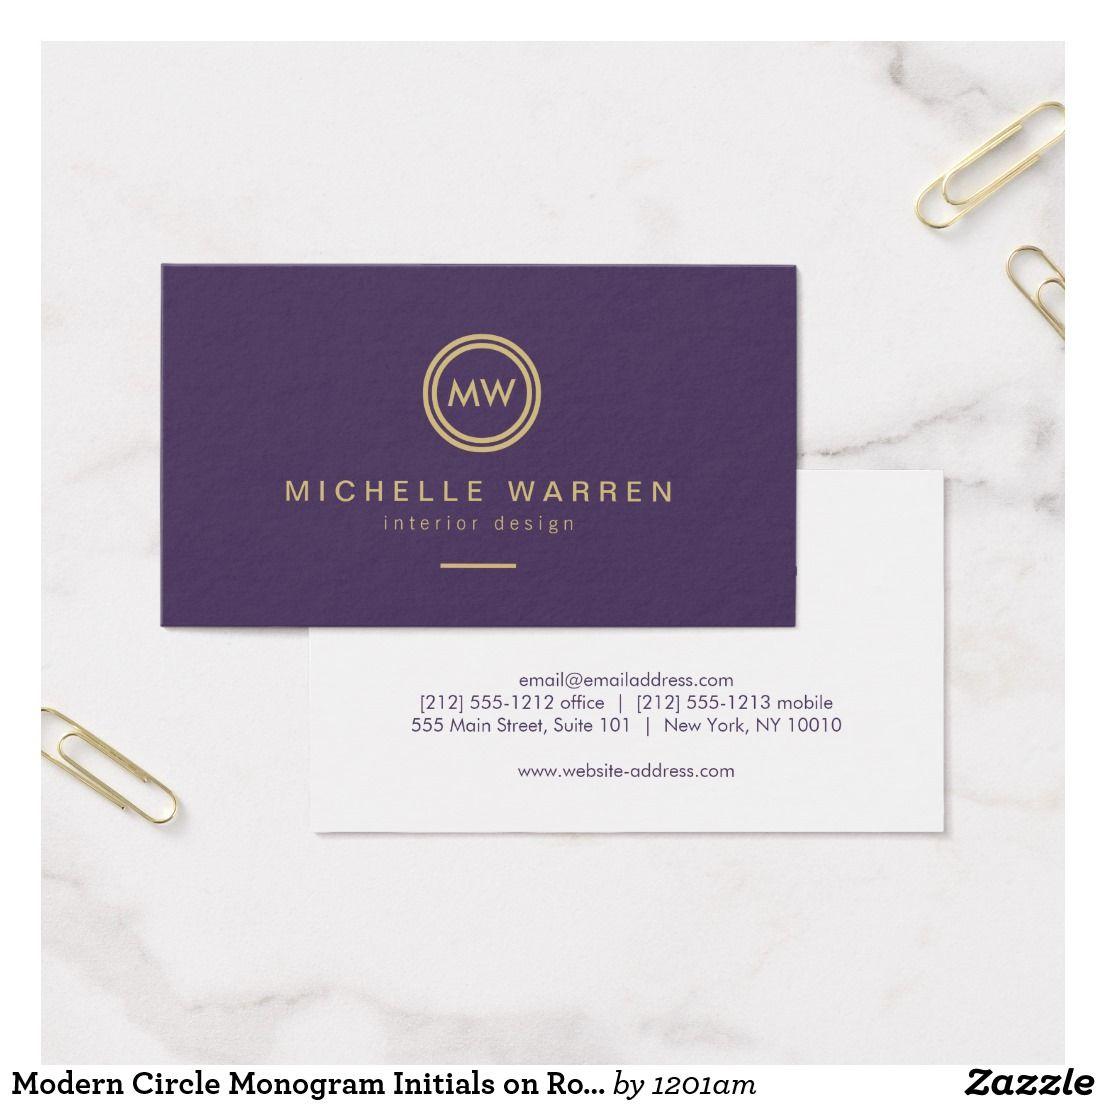 Modern Circle Monogram Initials on Royal Purple Business Card ...